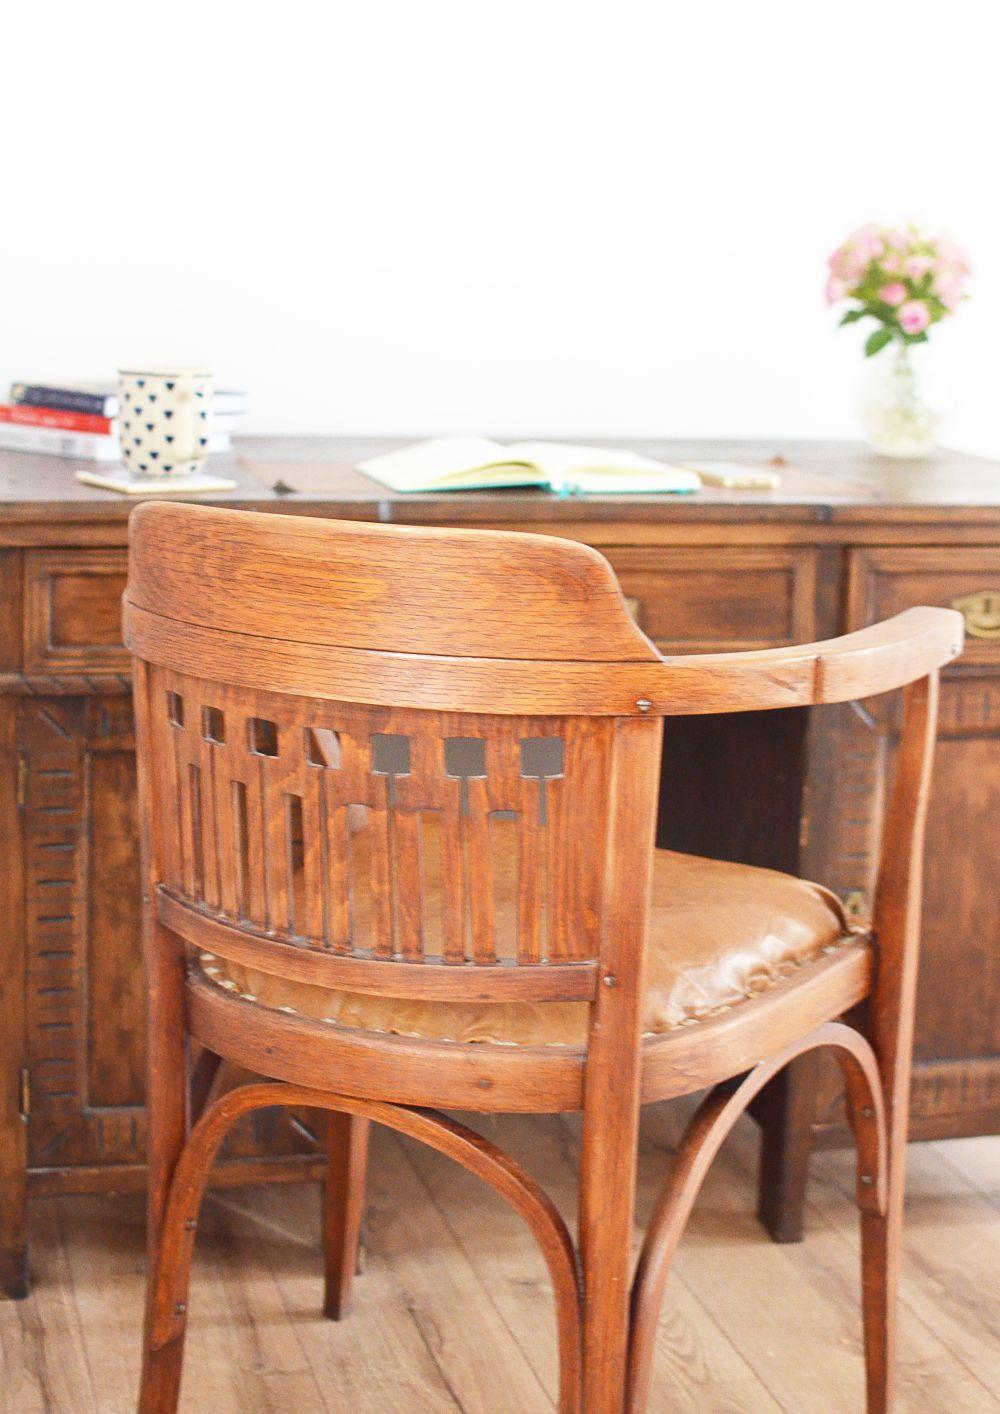 Stare biurko, antyk